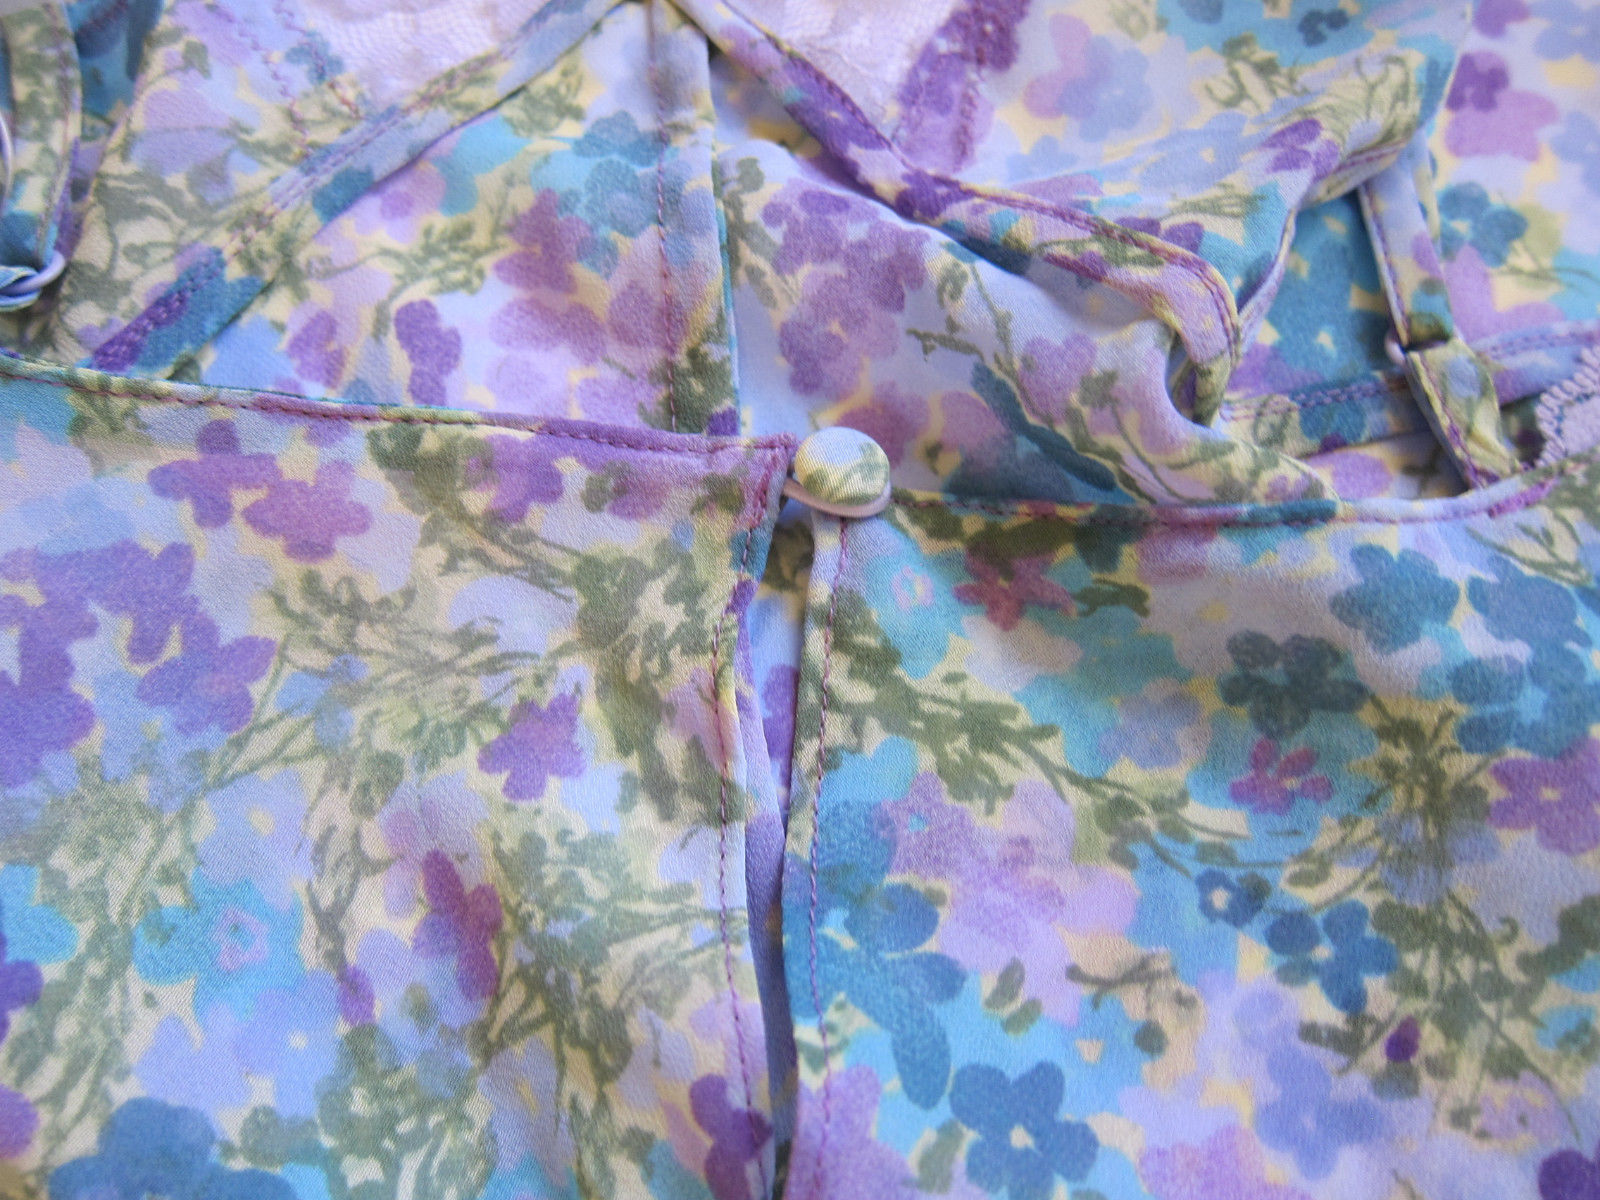 de5852a9c VINTAGE Victoria s Secret NWT Floral Sheer Thong Thong Teddy Lingerie MEDIUM